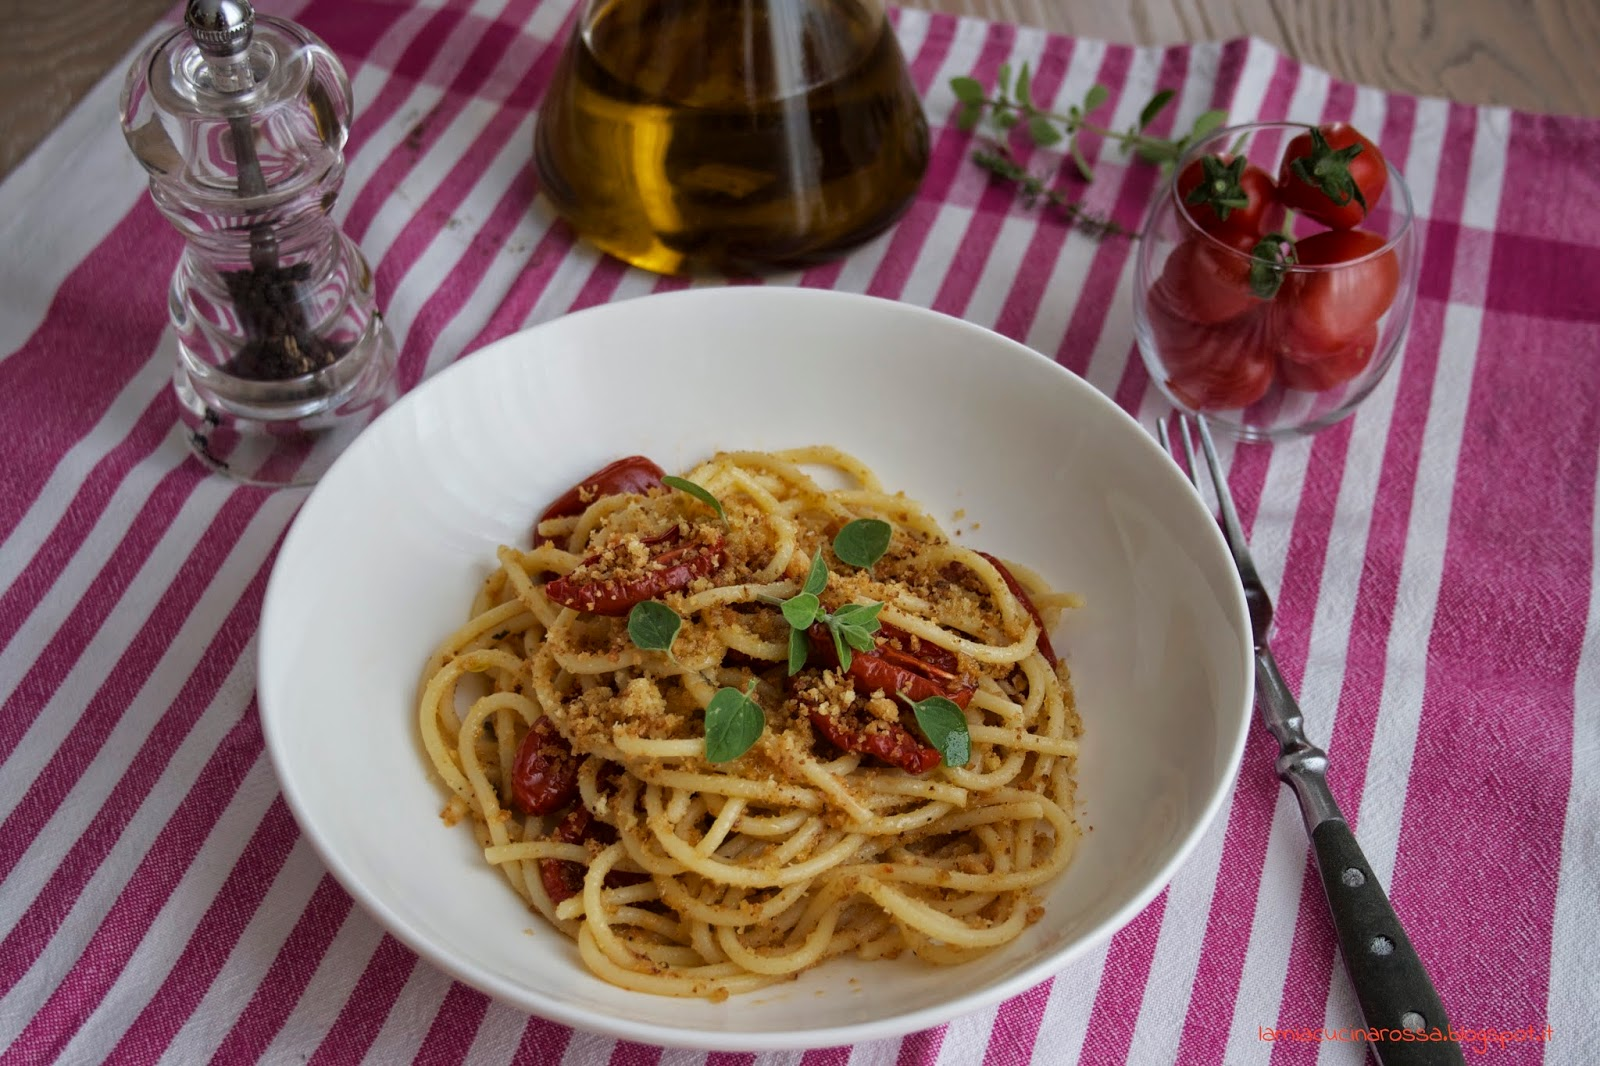 Cosa si mangia a Parigi? Spaghetti ai pomodorini confit!